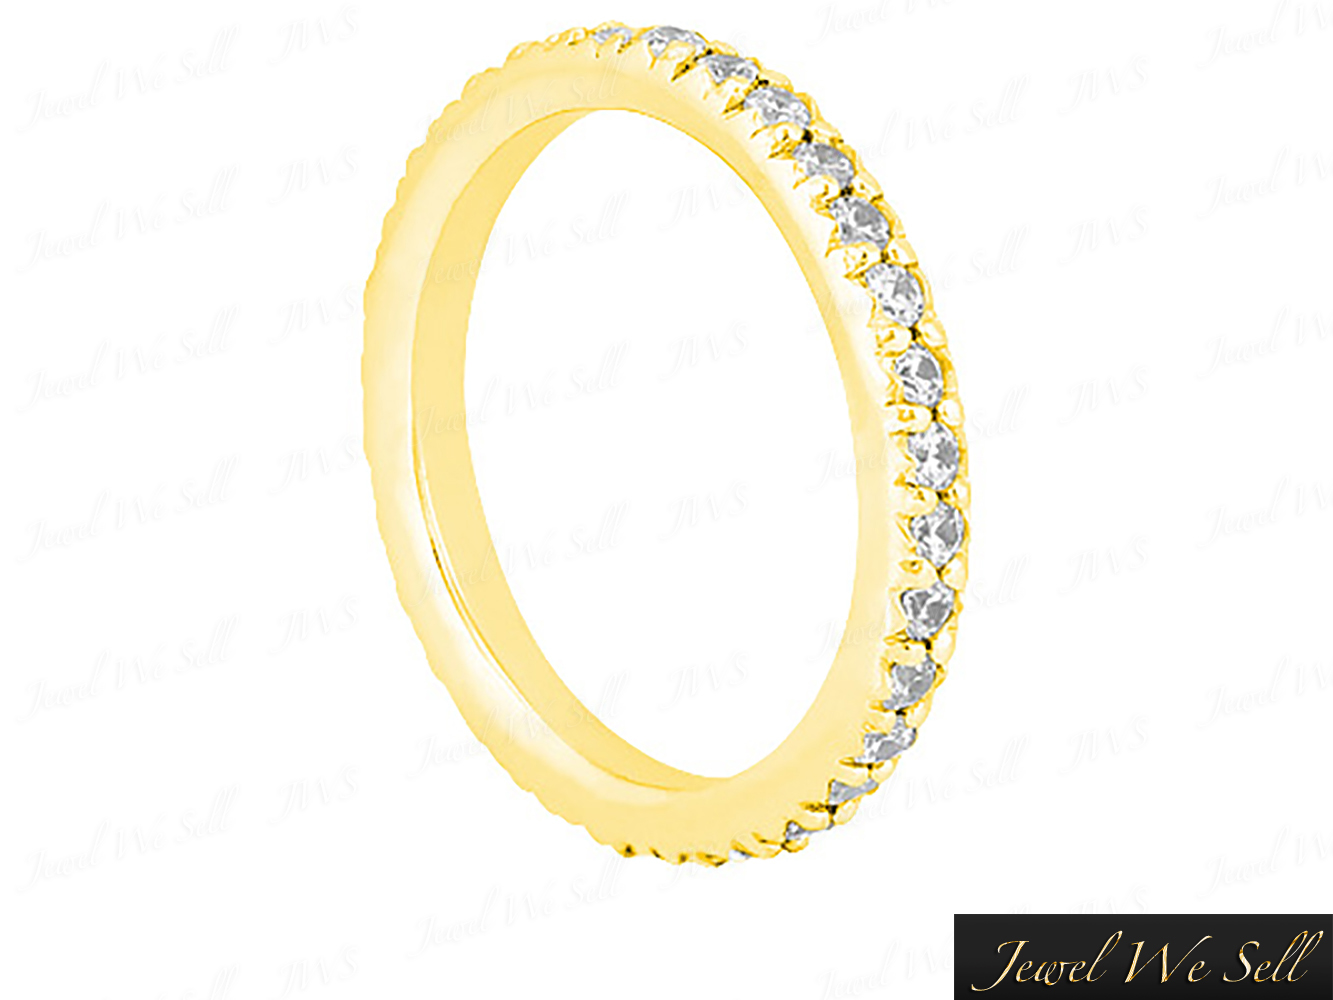 0-70Ct-Round-Cut-Diamond-Pave-Set-Anniversary-Eternity-Band-Ring-10K-Gold-G-H-I1 thumbnail 6